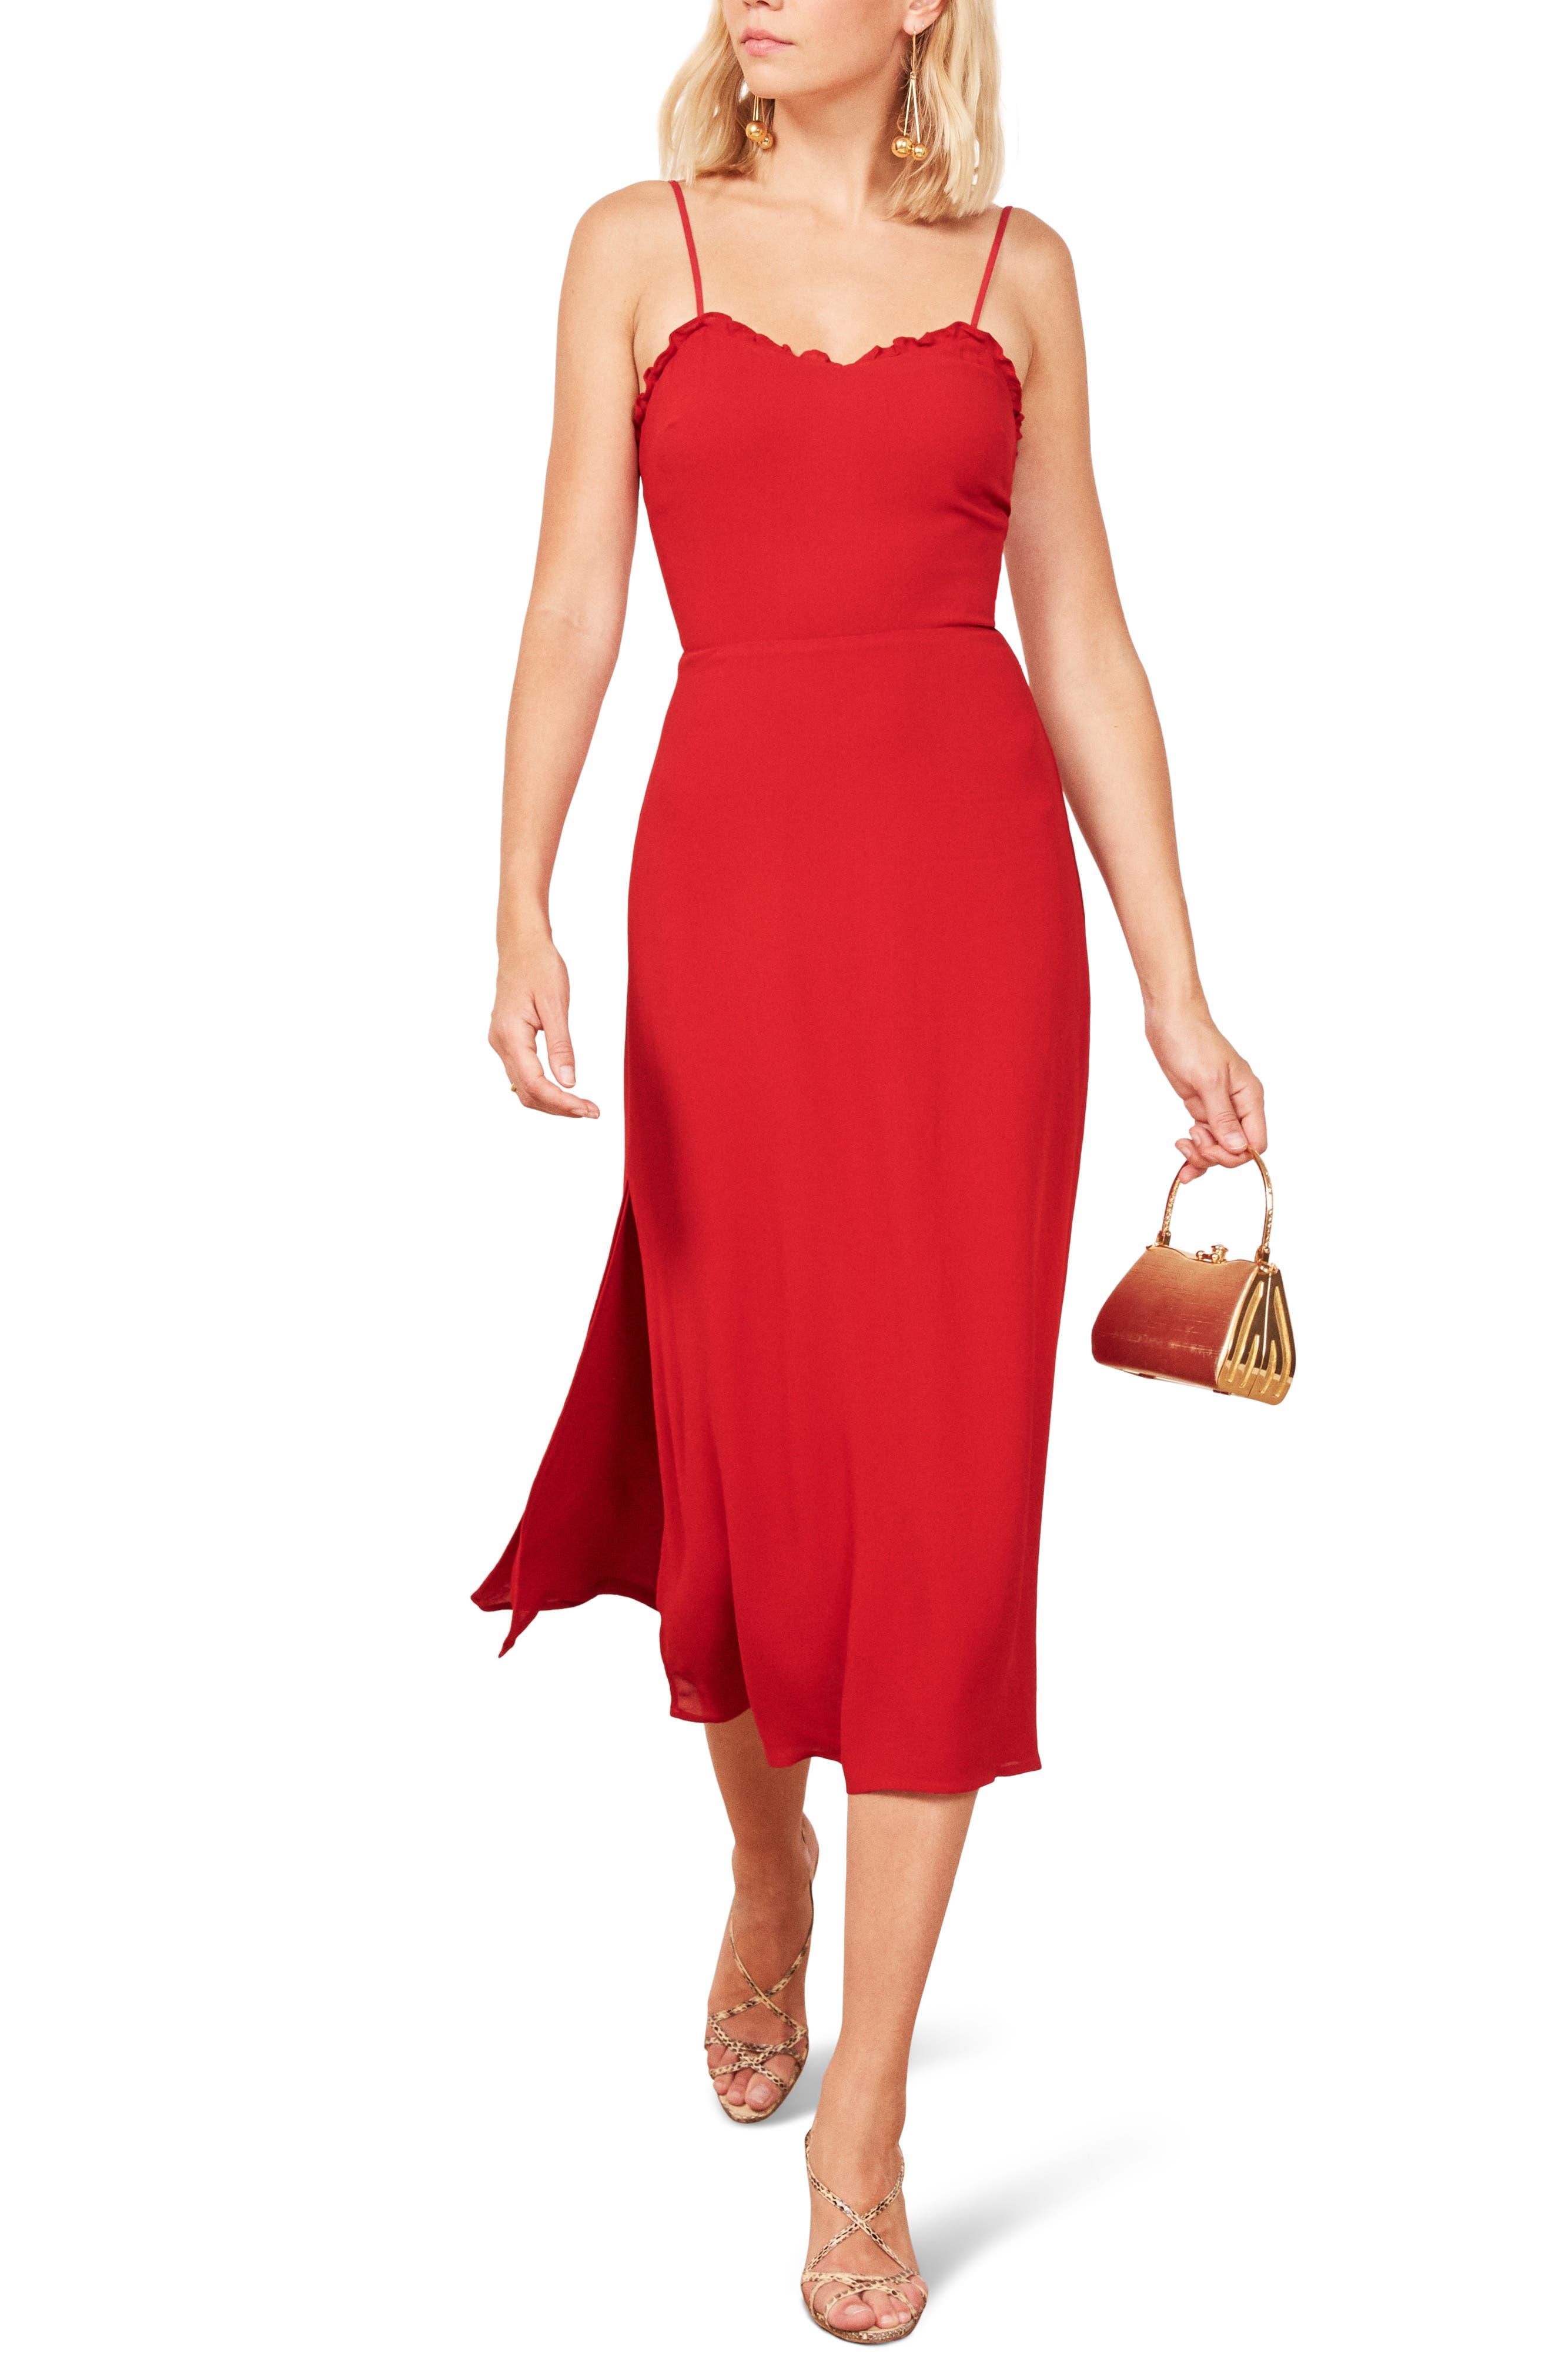 Reformation Cassandra Floral Dress, Red